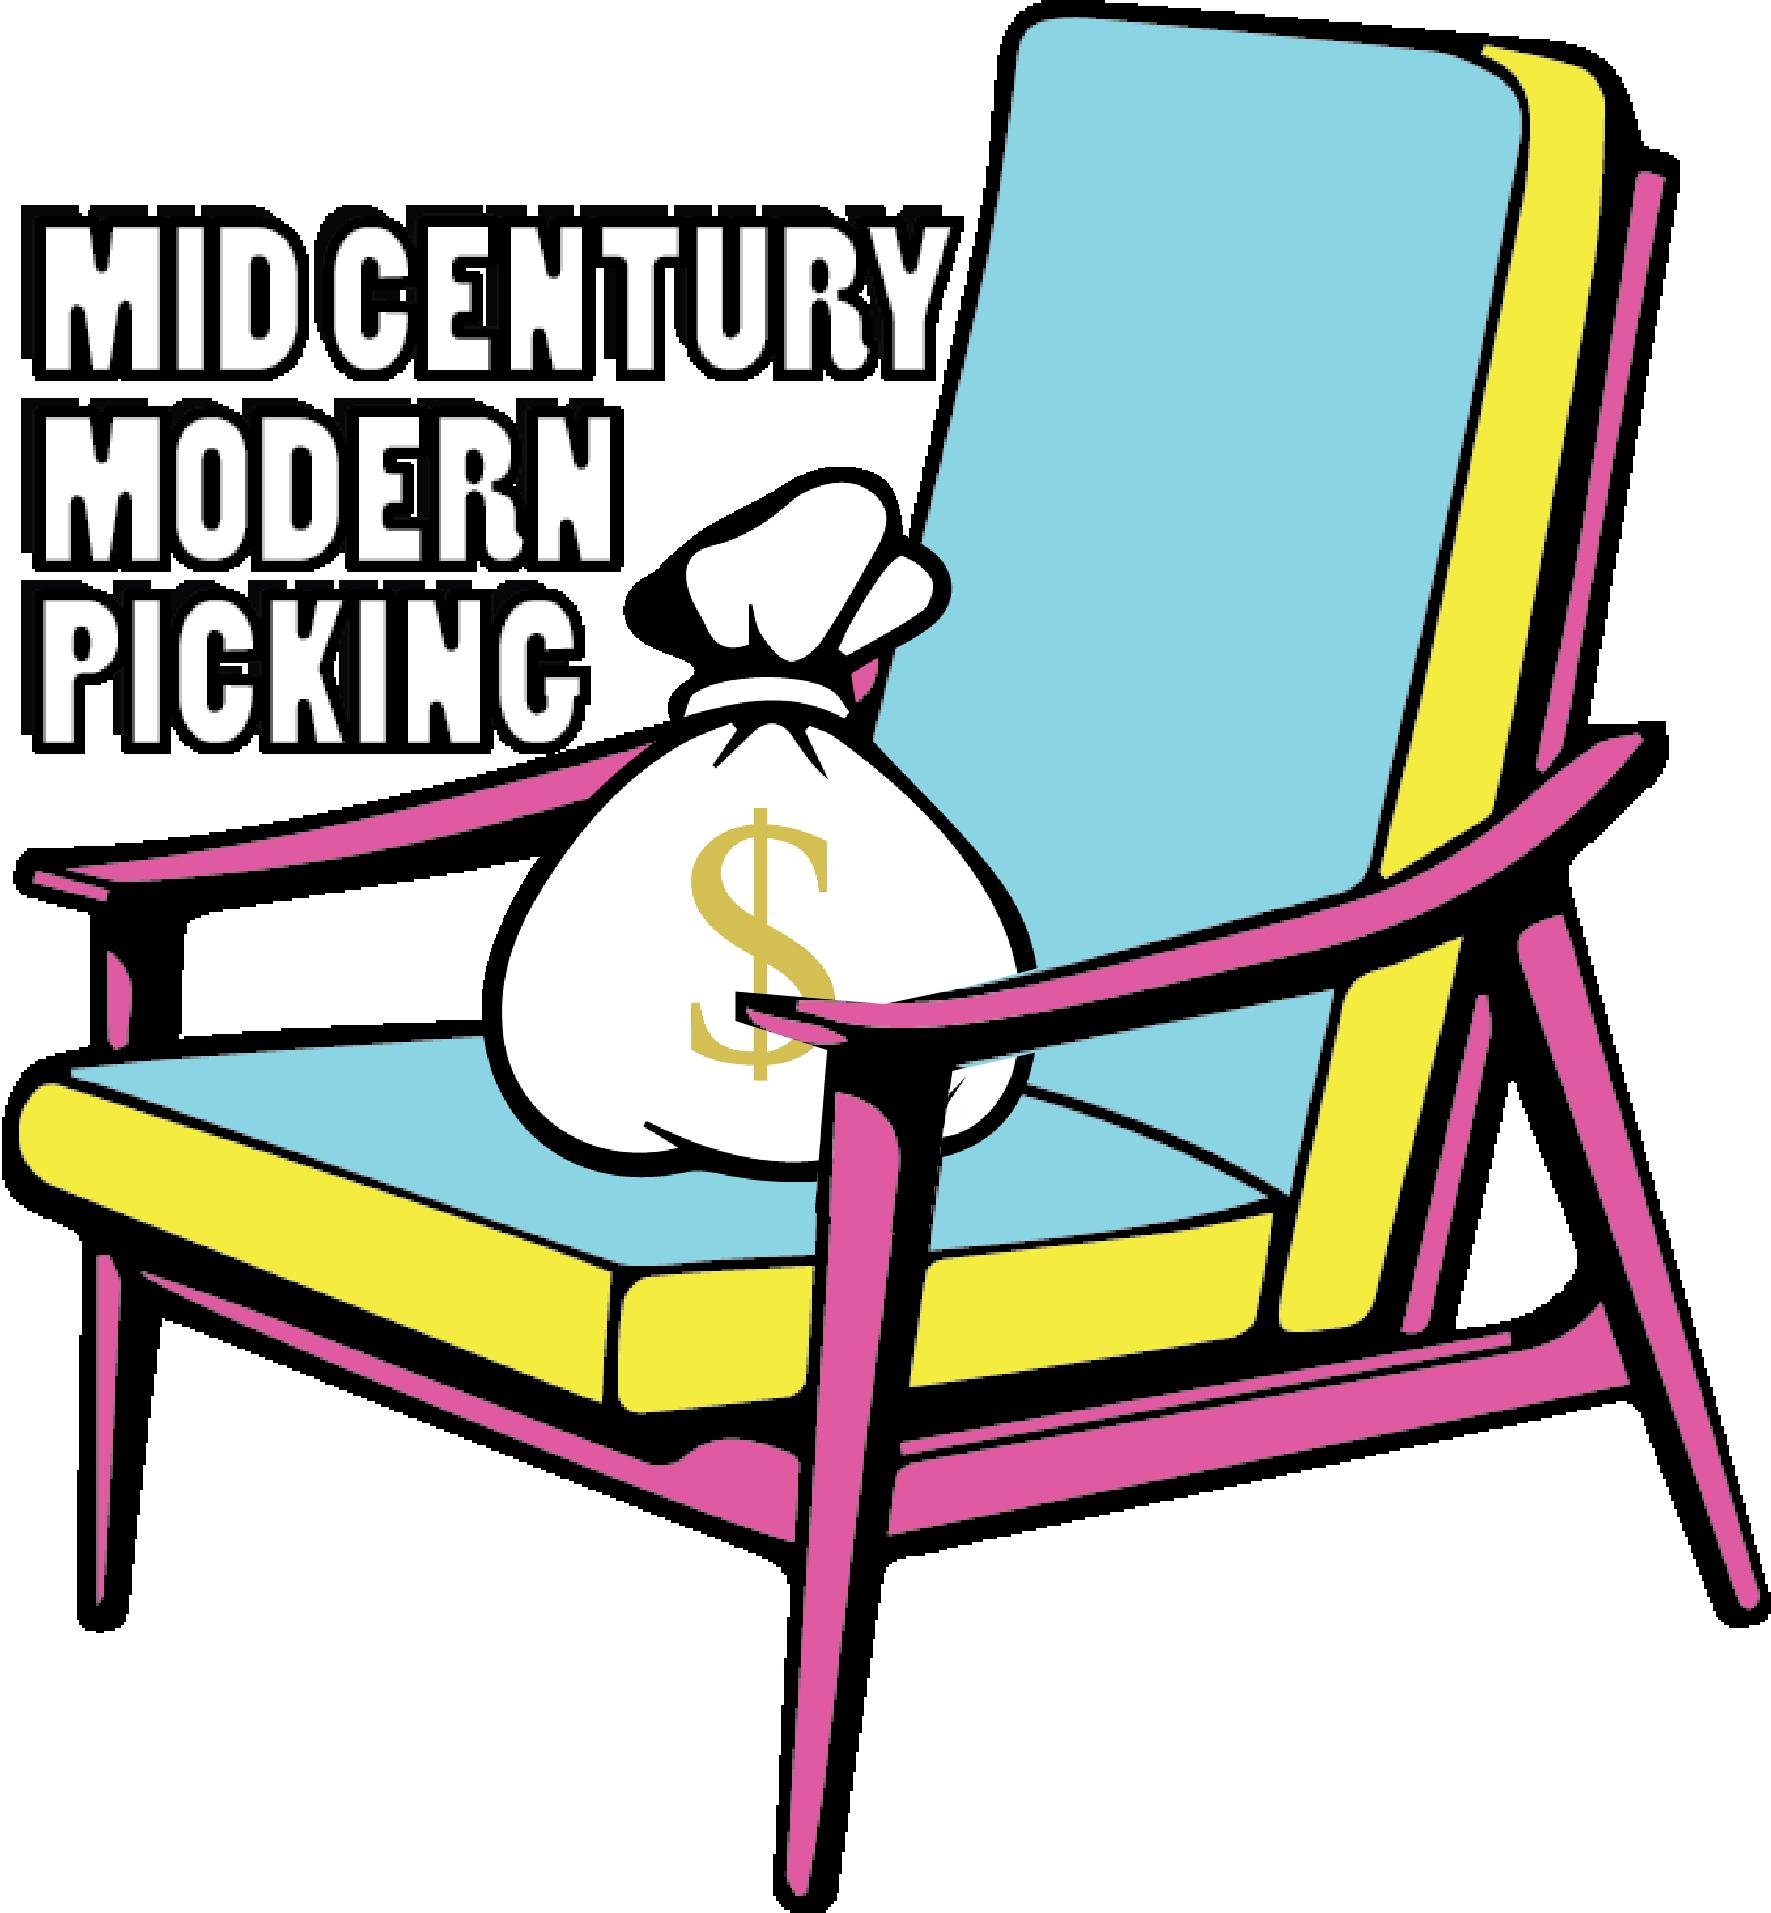 mid century modern furniture tutorials on how to buy repair - Where To Buy Modern Furniture